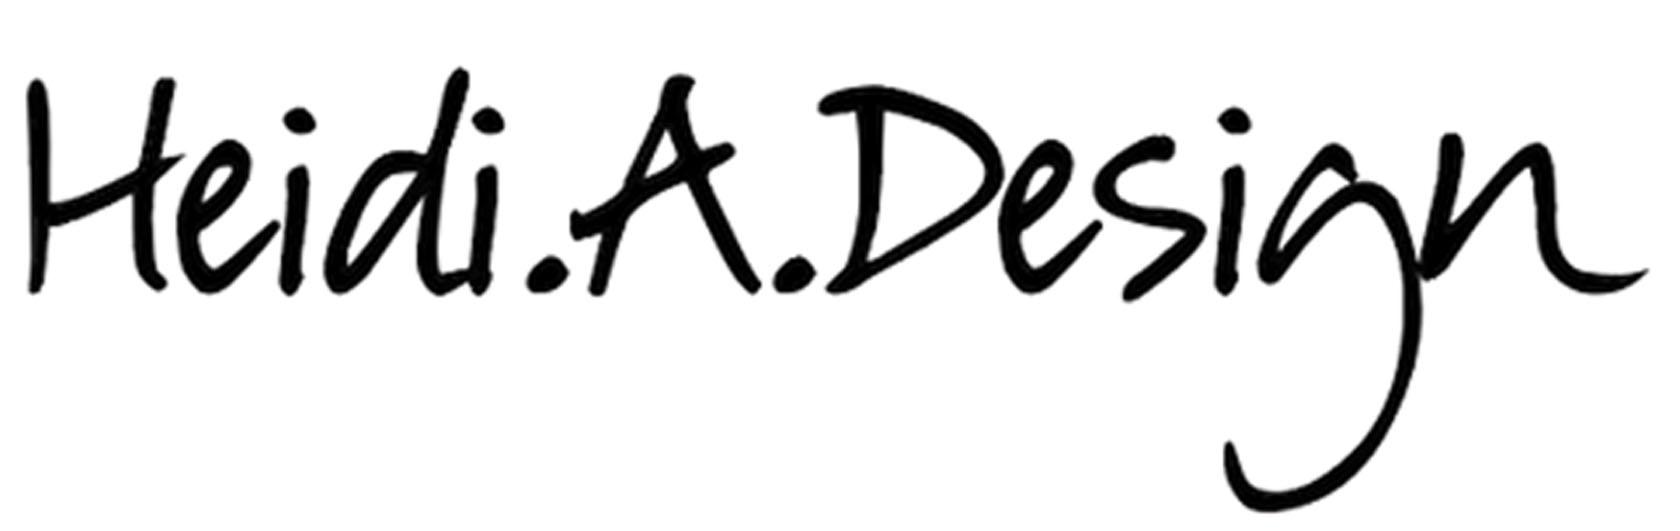 Heidi.A.Design